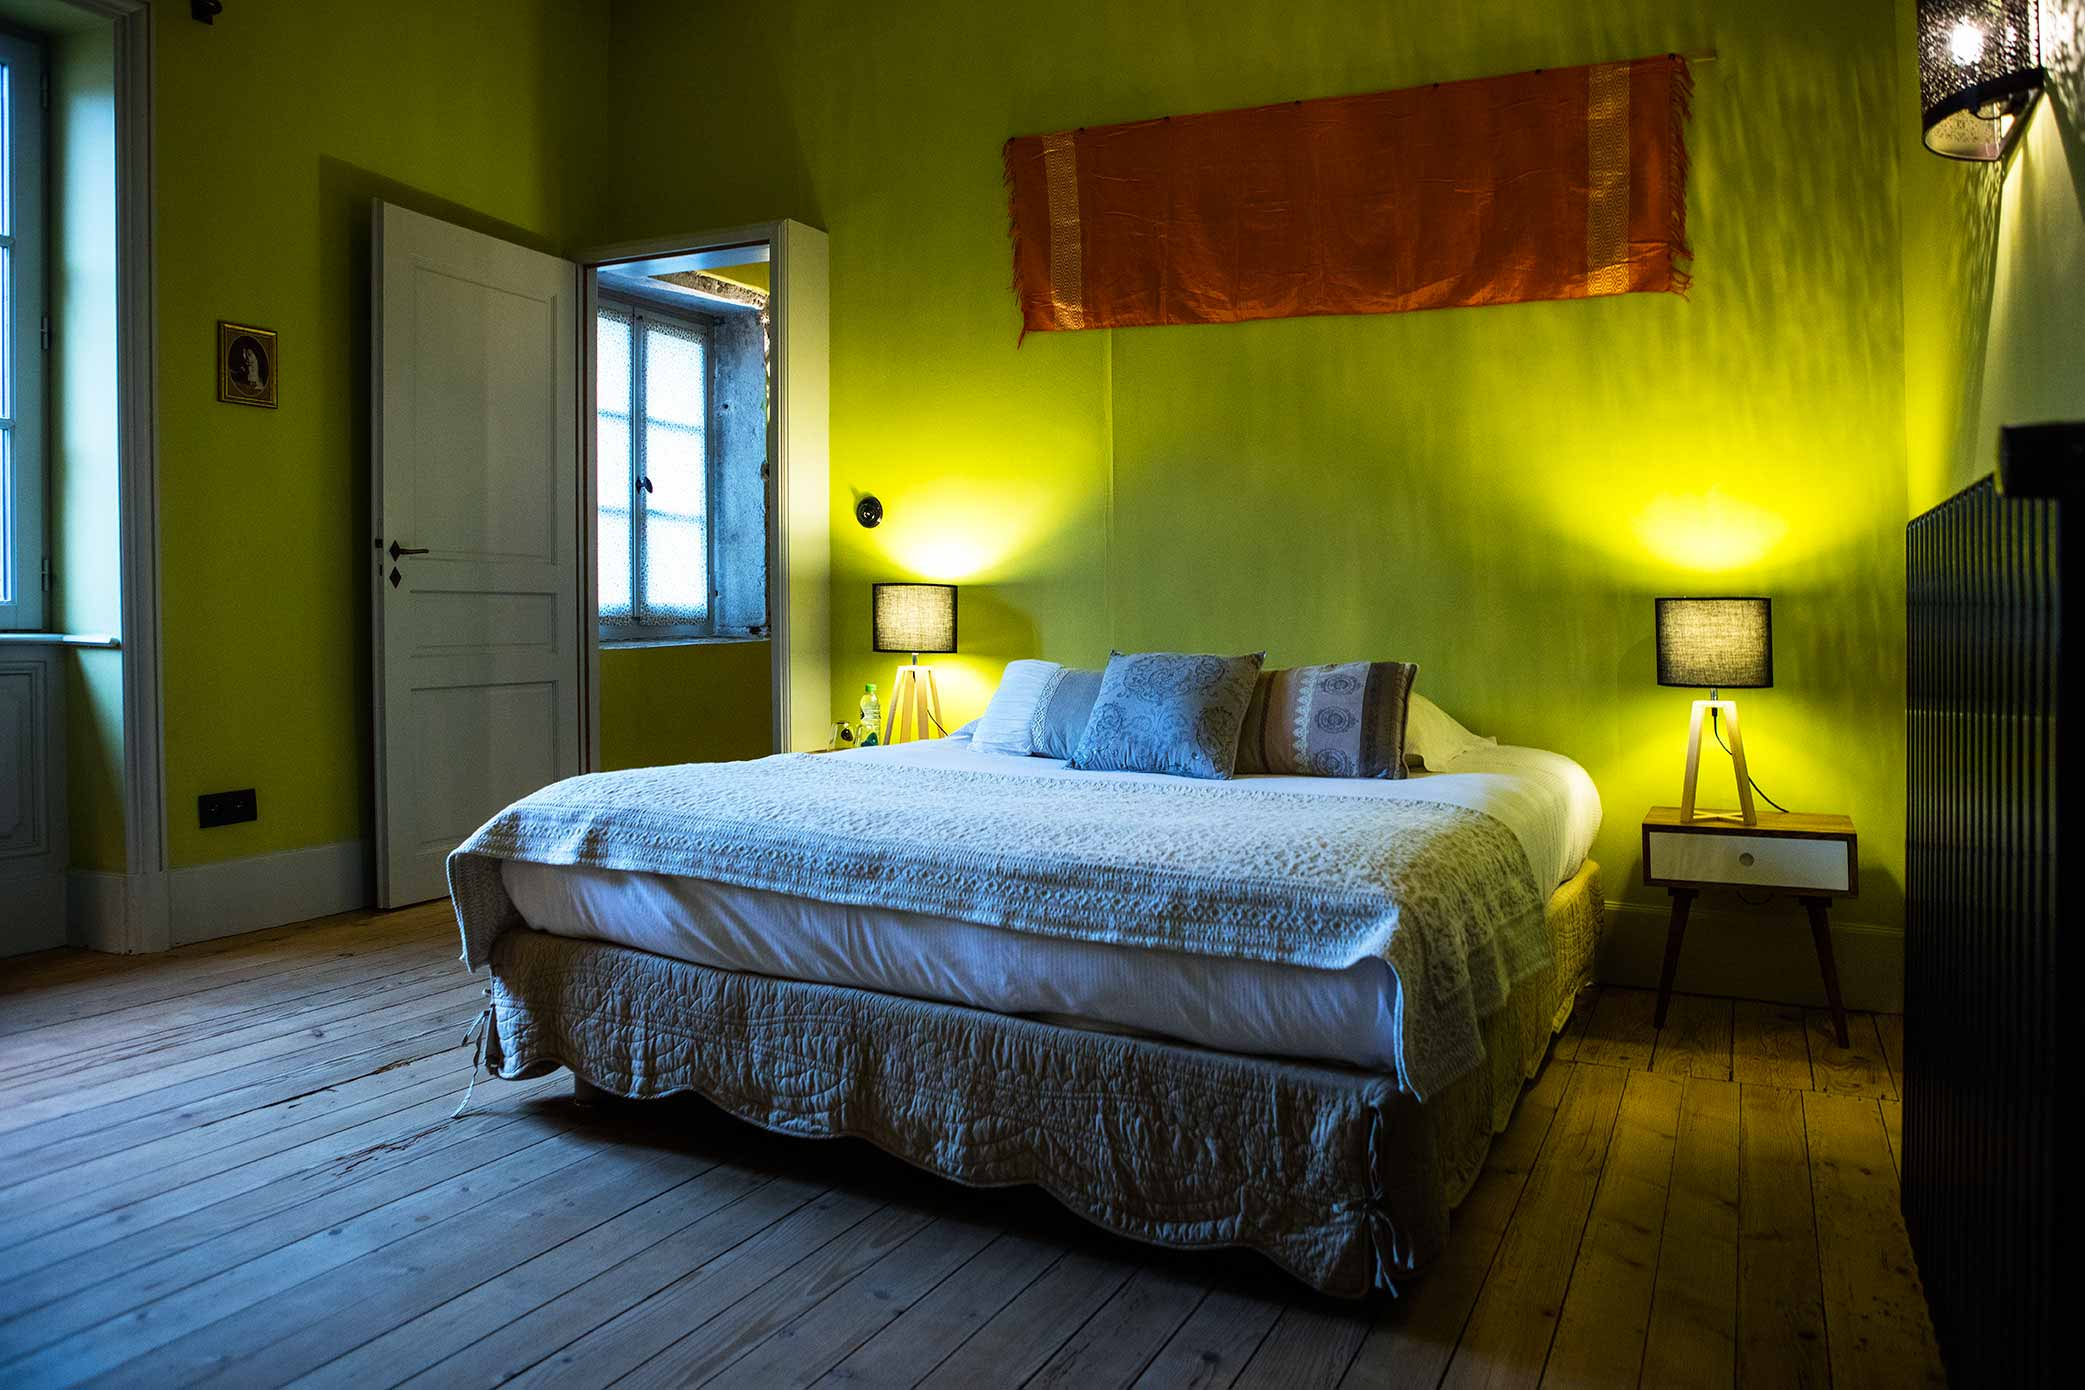 chambres d 39 h tes bourgogne fuiss. Black Bedroom Furniture Sets. Home Design Ideas